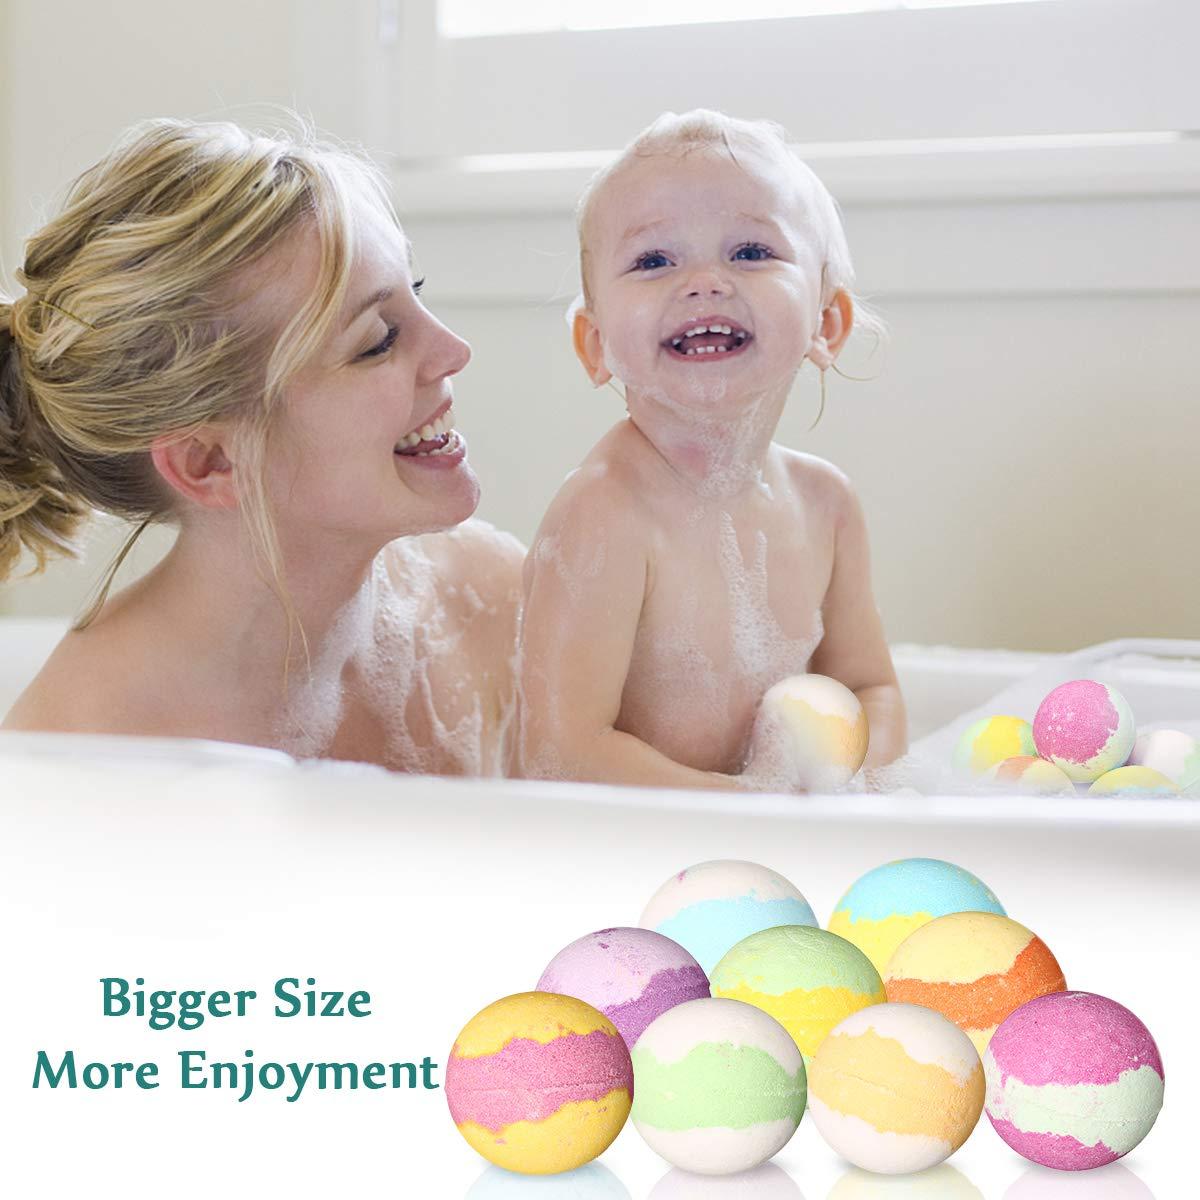 Essort Bath Bombs Gift Set, Coolroom Monopoly Factory Direct Gift Box Set 9 × 60g Effervescent Balls